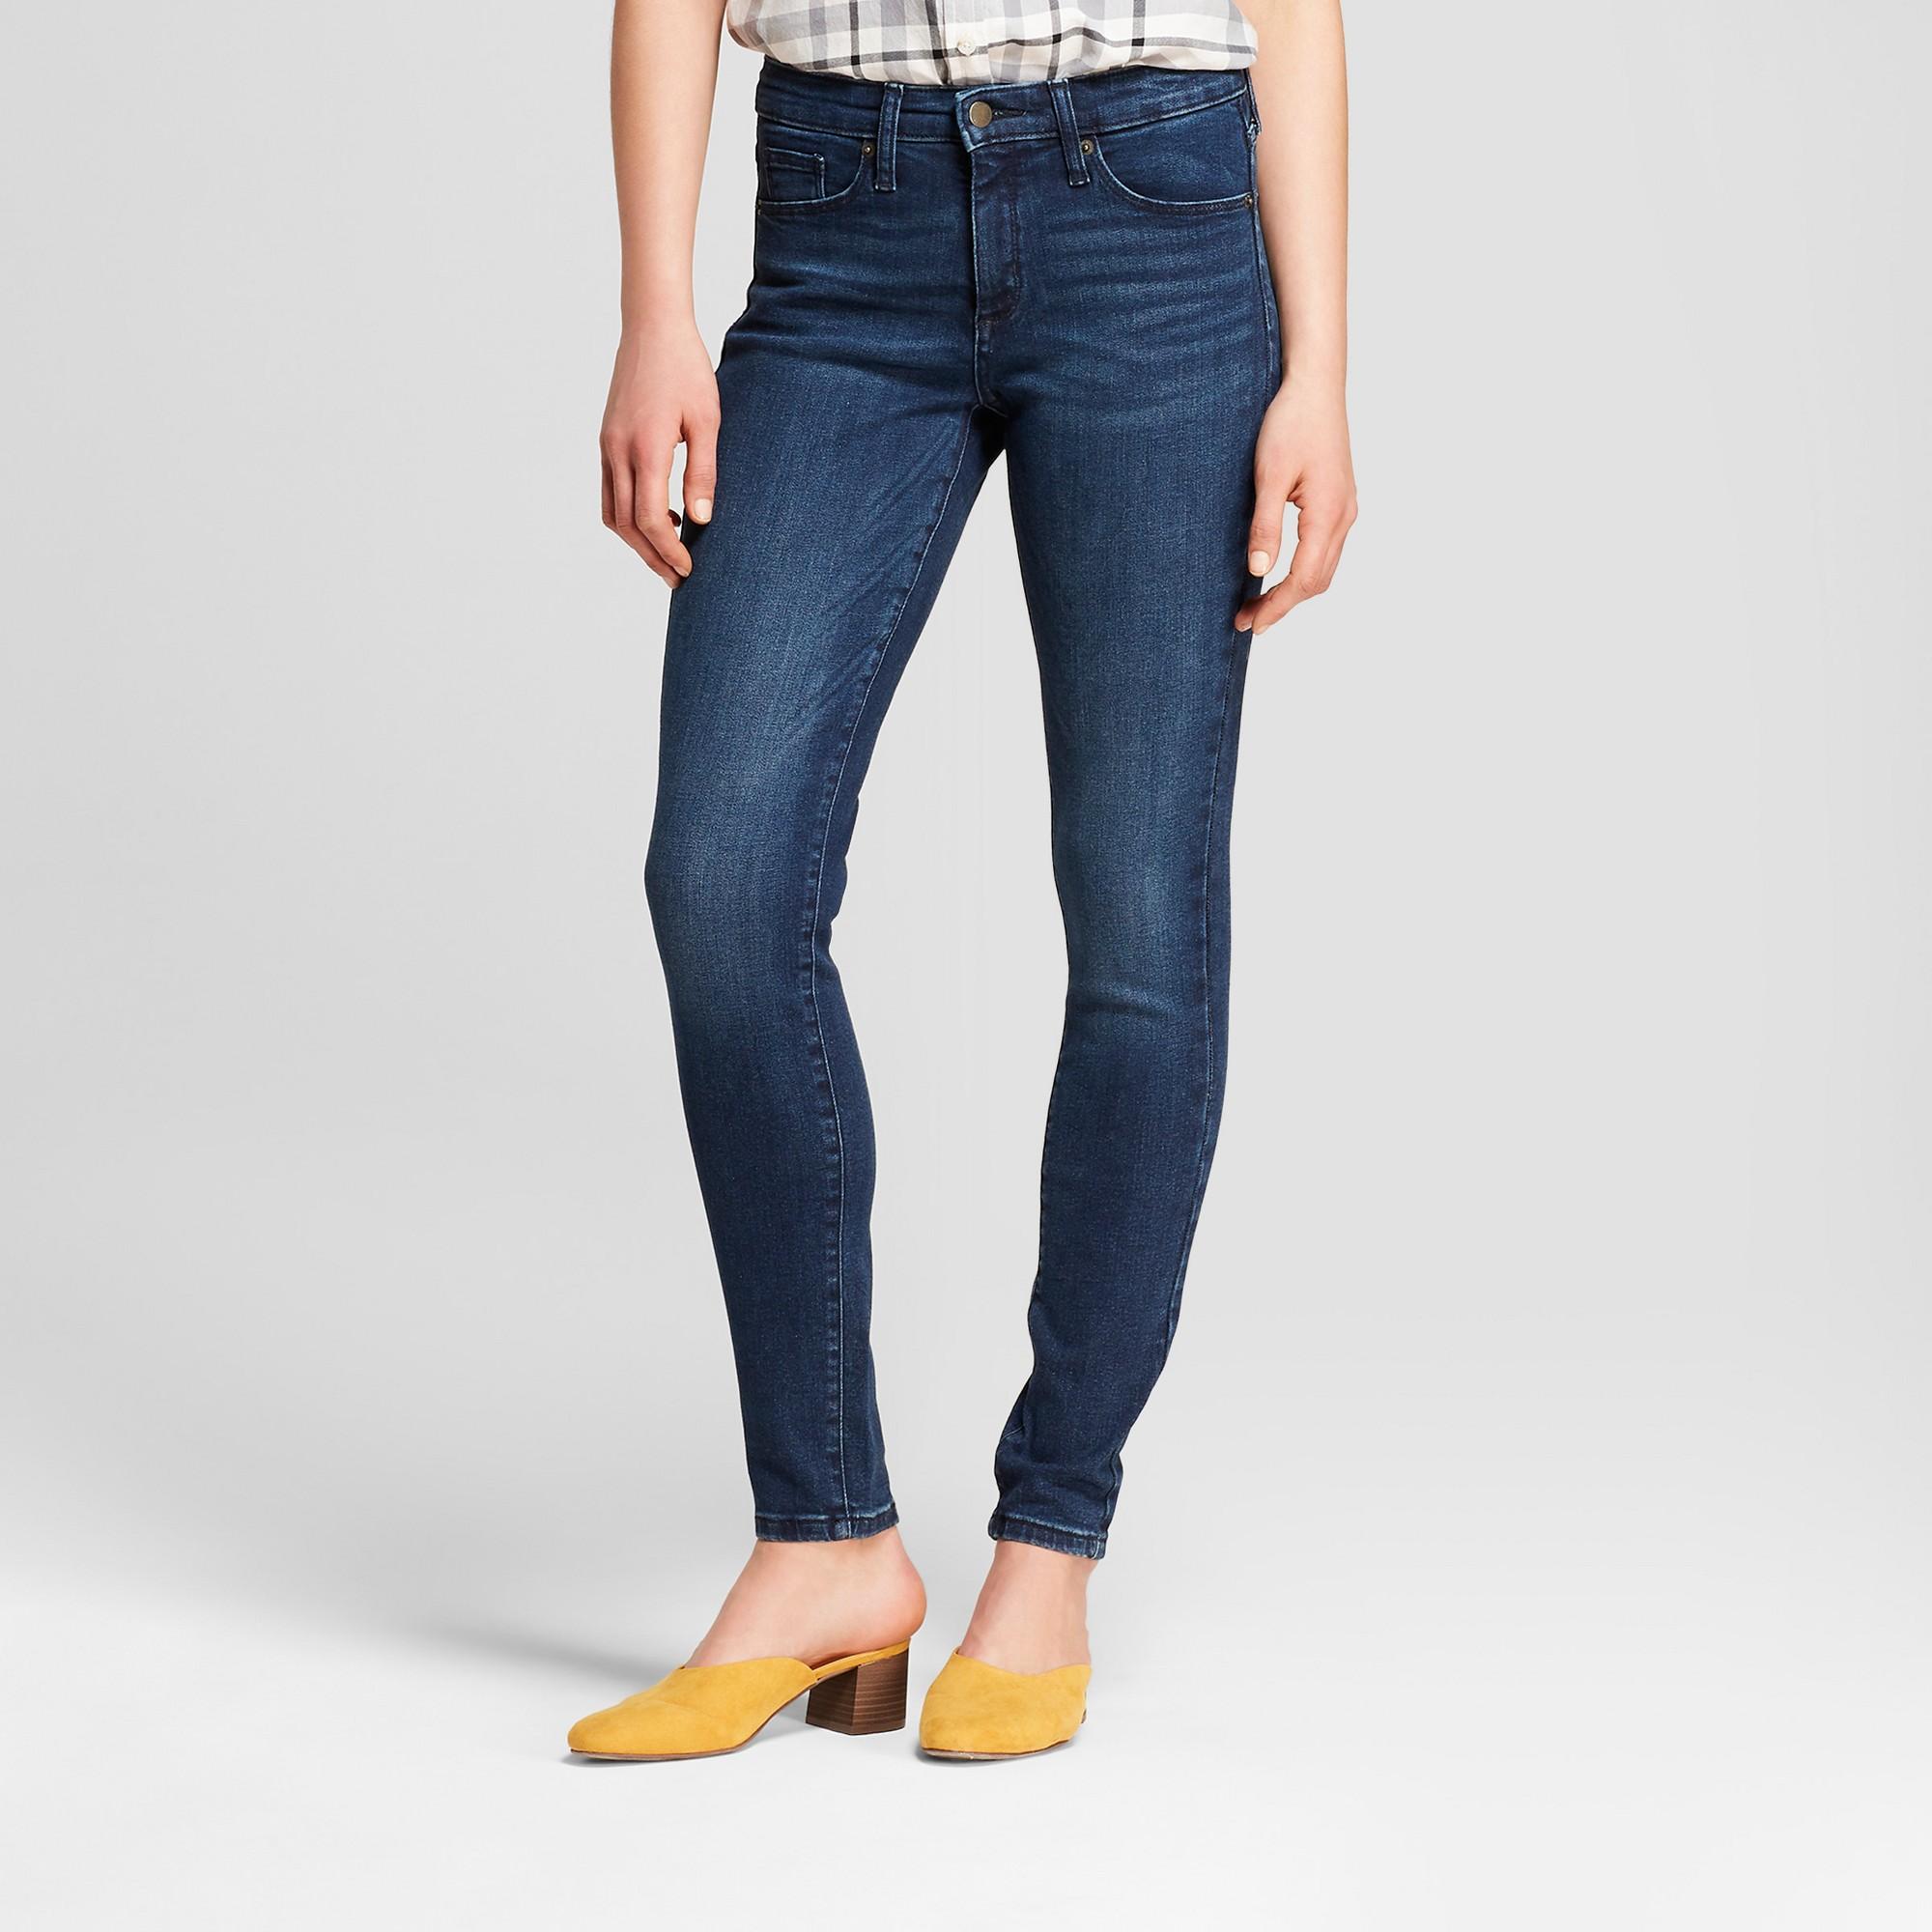 Women's High-Rise Skinny Jeans - Universal Thread Medium Wash 14 Short, Blue